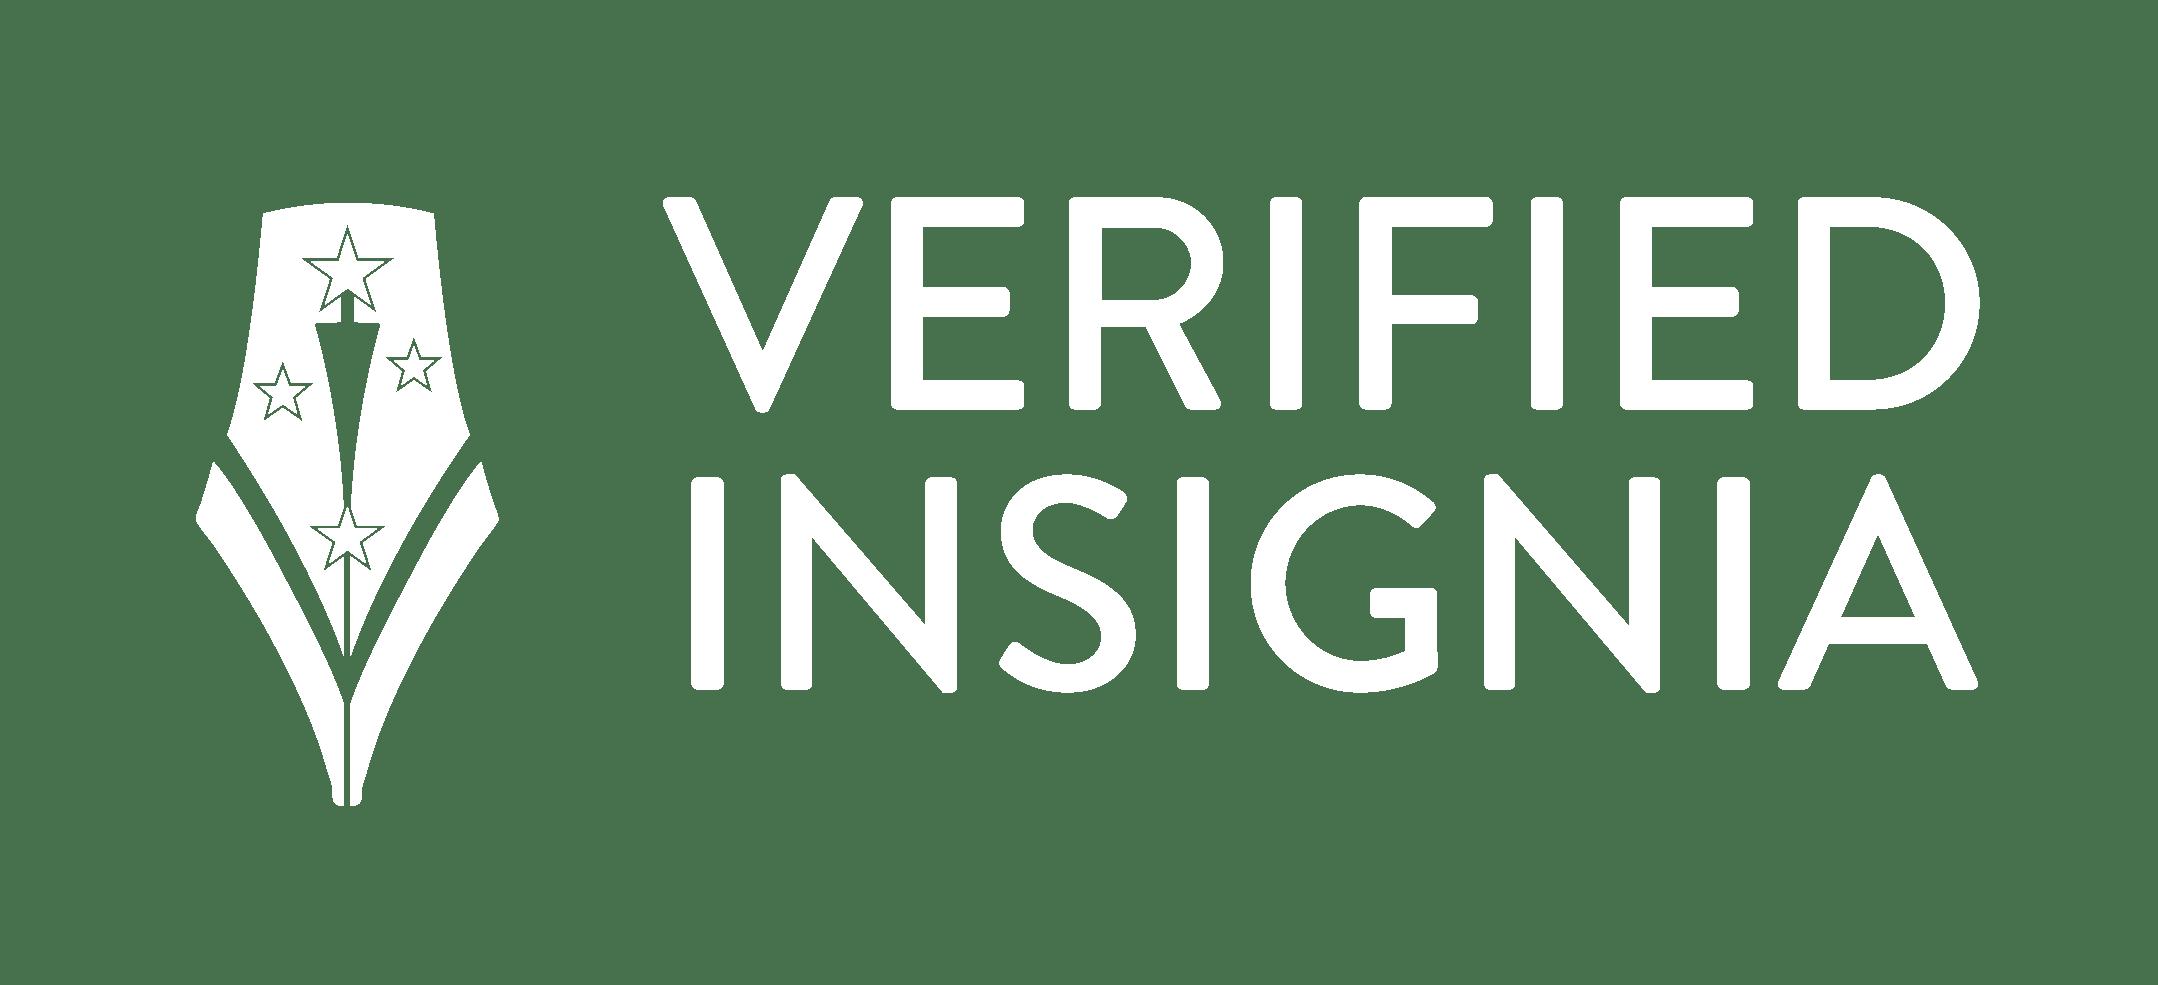 Verified Insignia